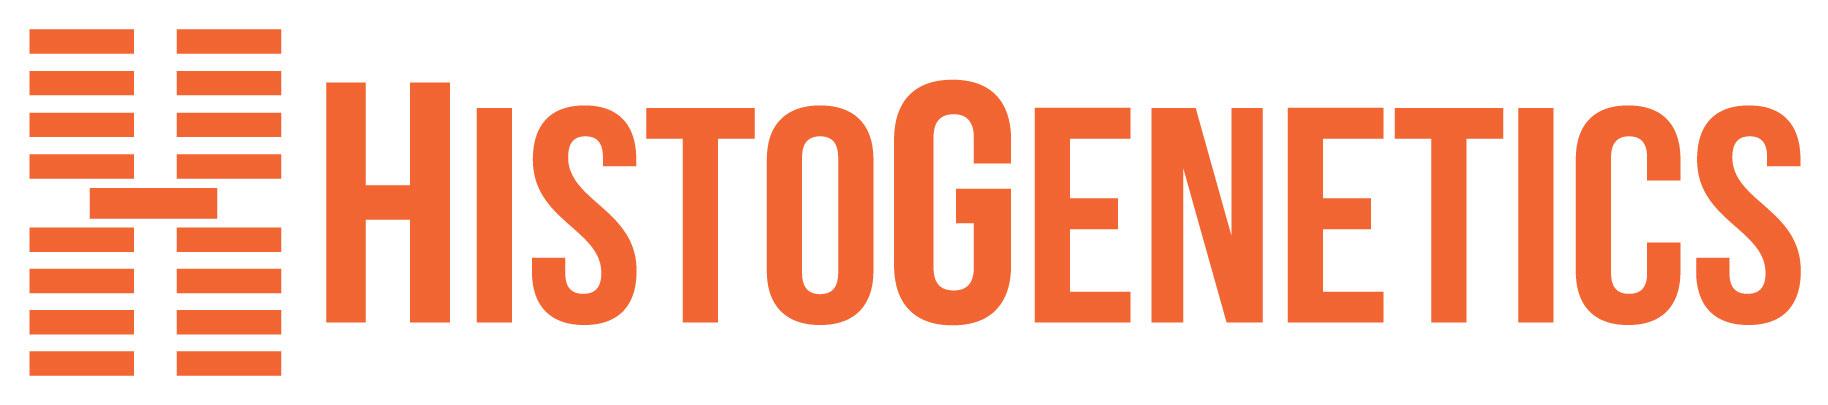 histogenetics logo